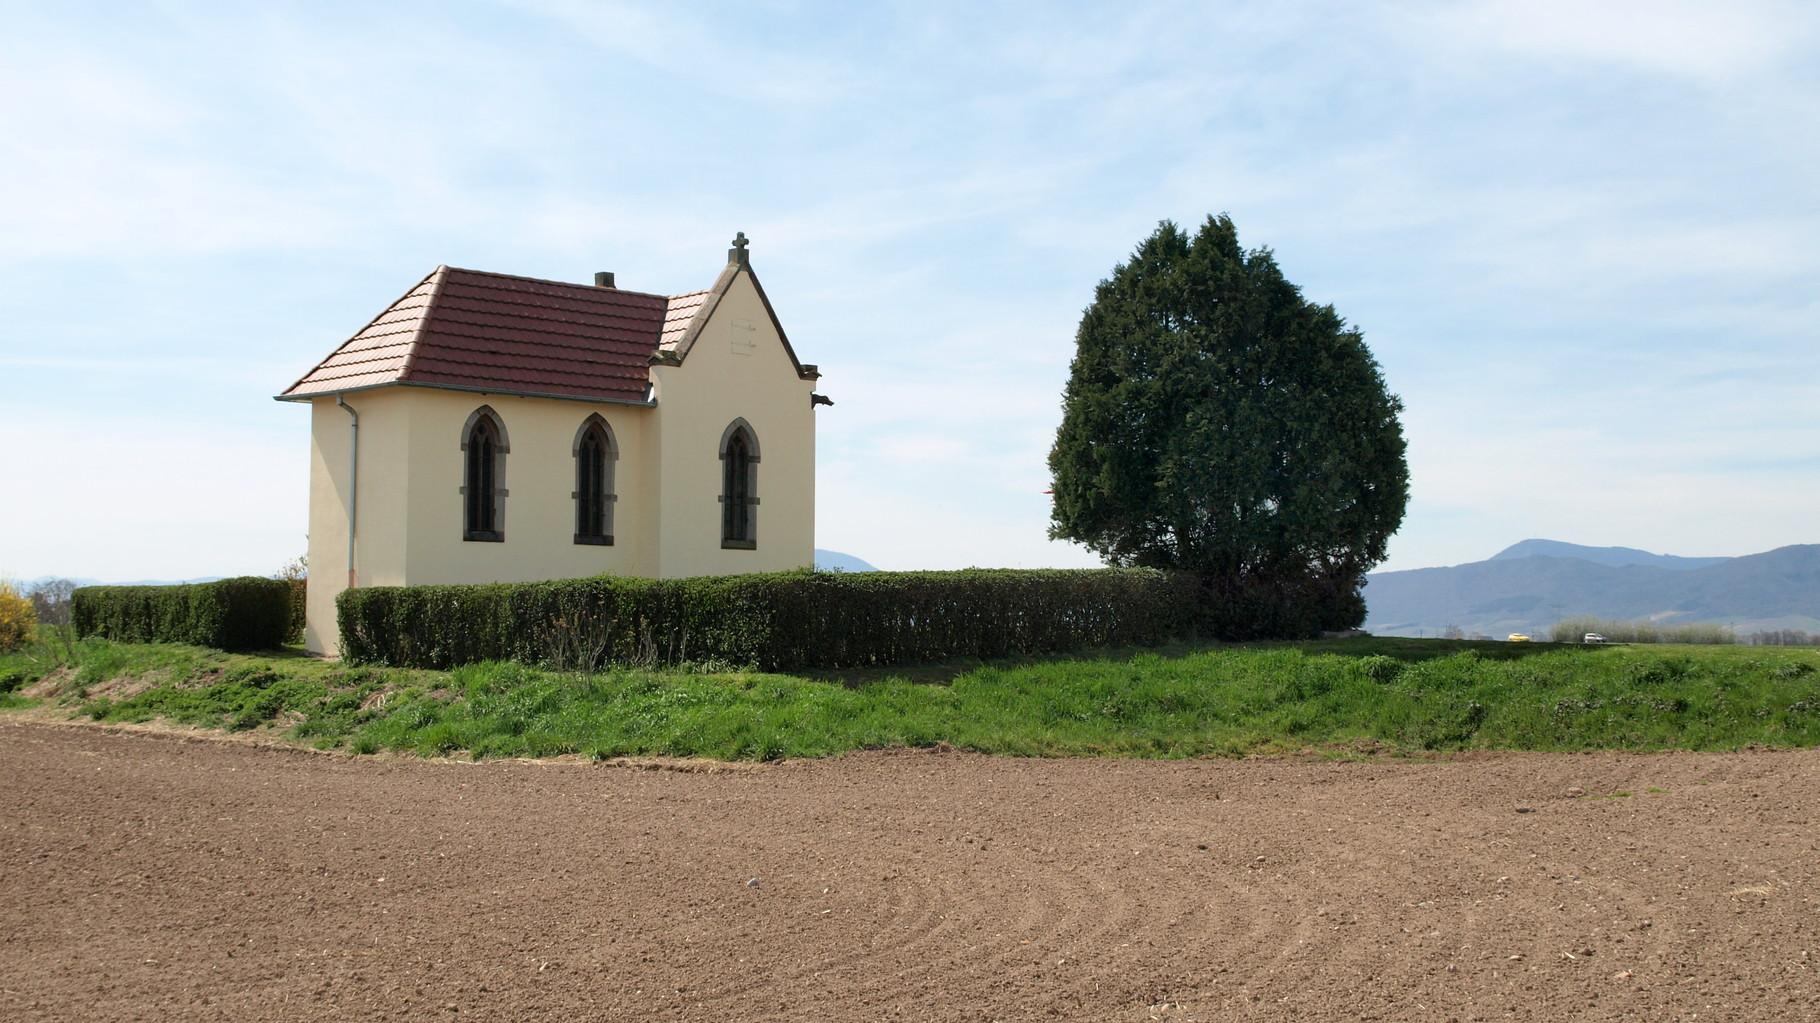 Chapelle de la Feldlach